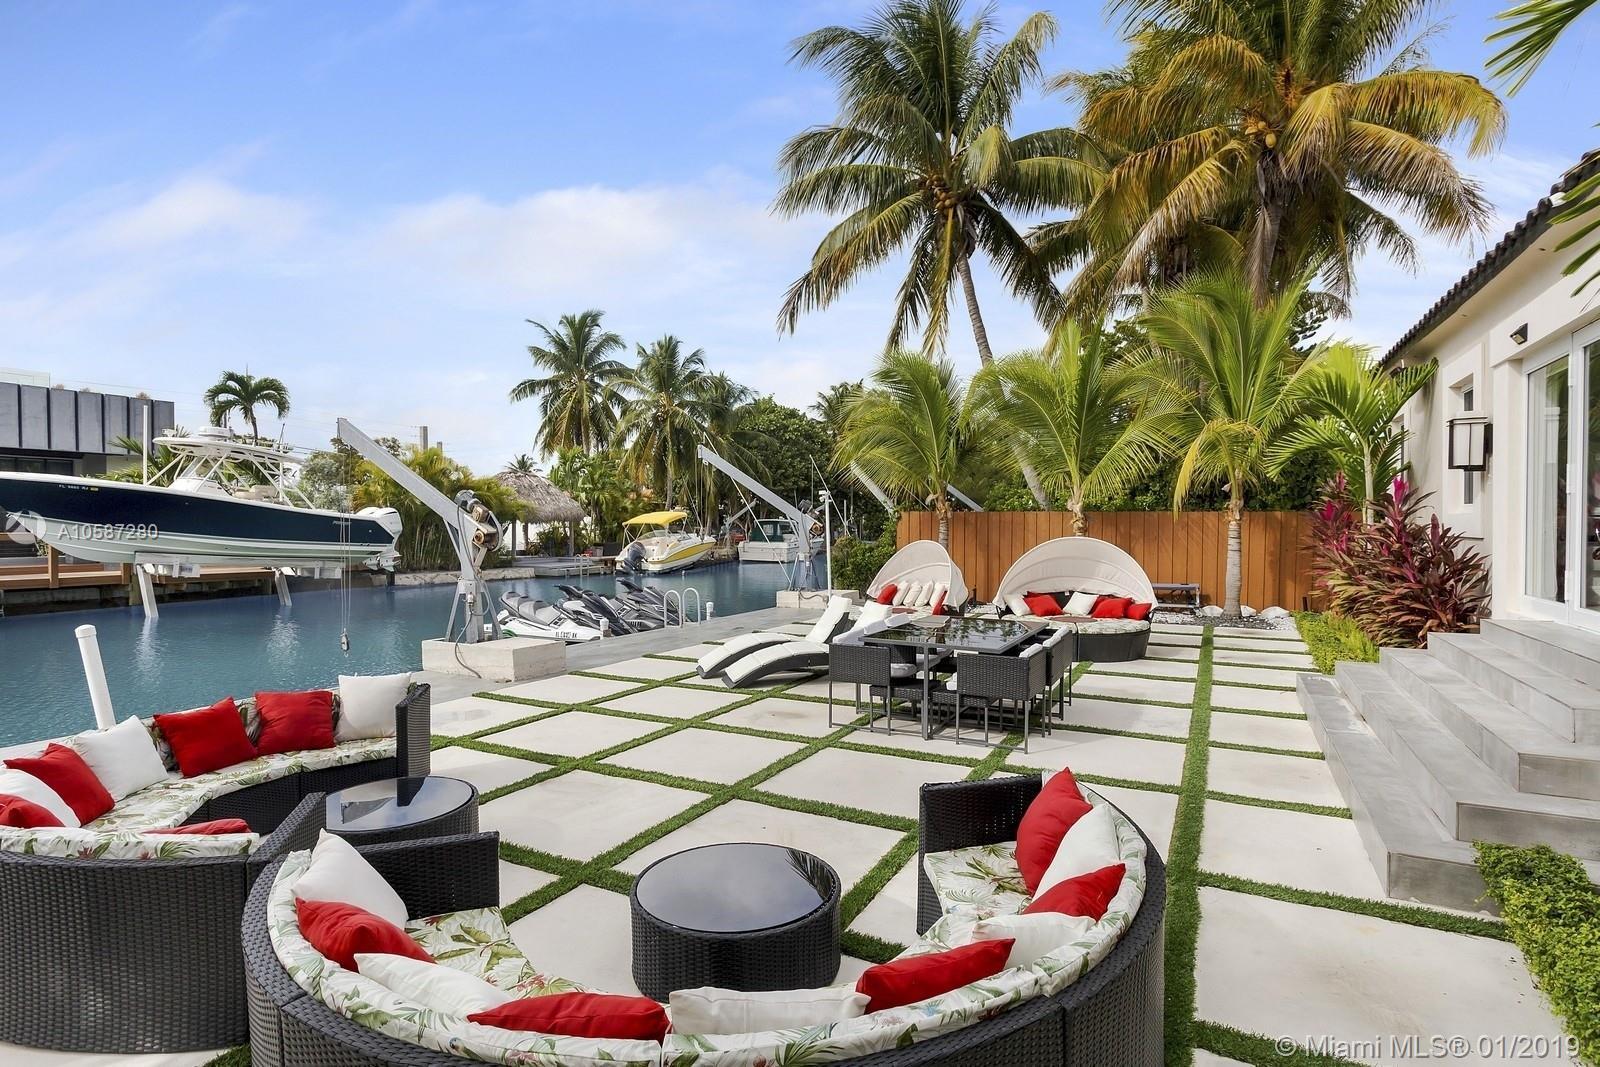 7990 Hawthorne Ave, Miami Beach, FL 33141 - Miami Beach, FL real estate listing